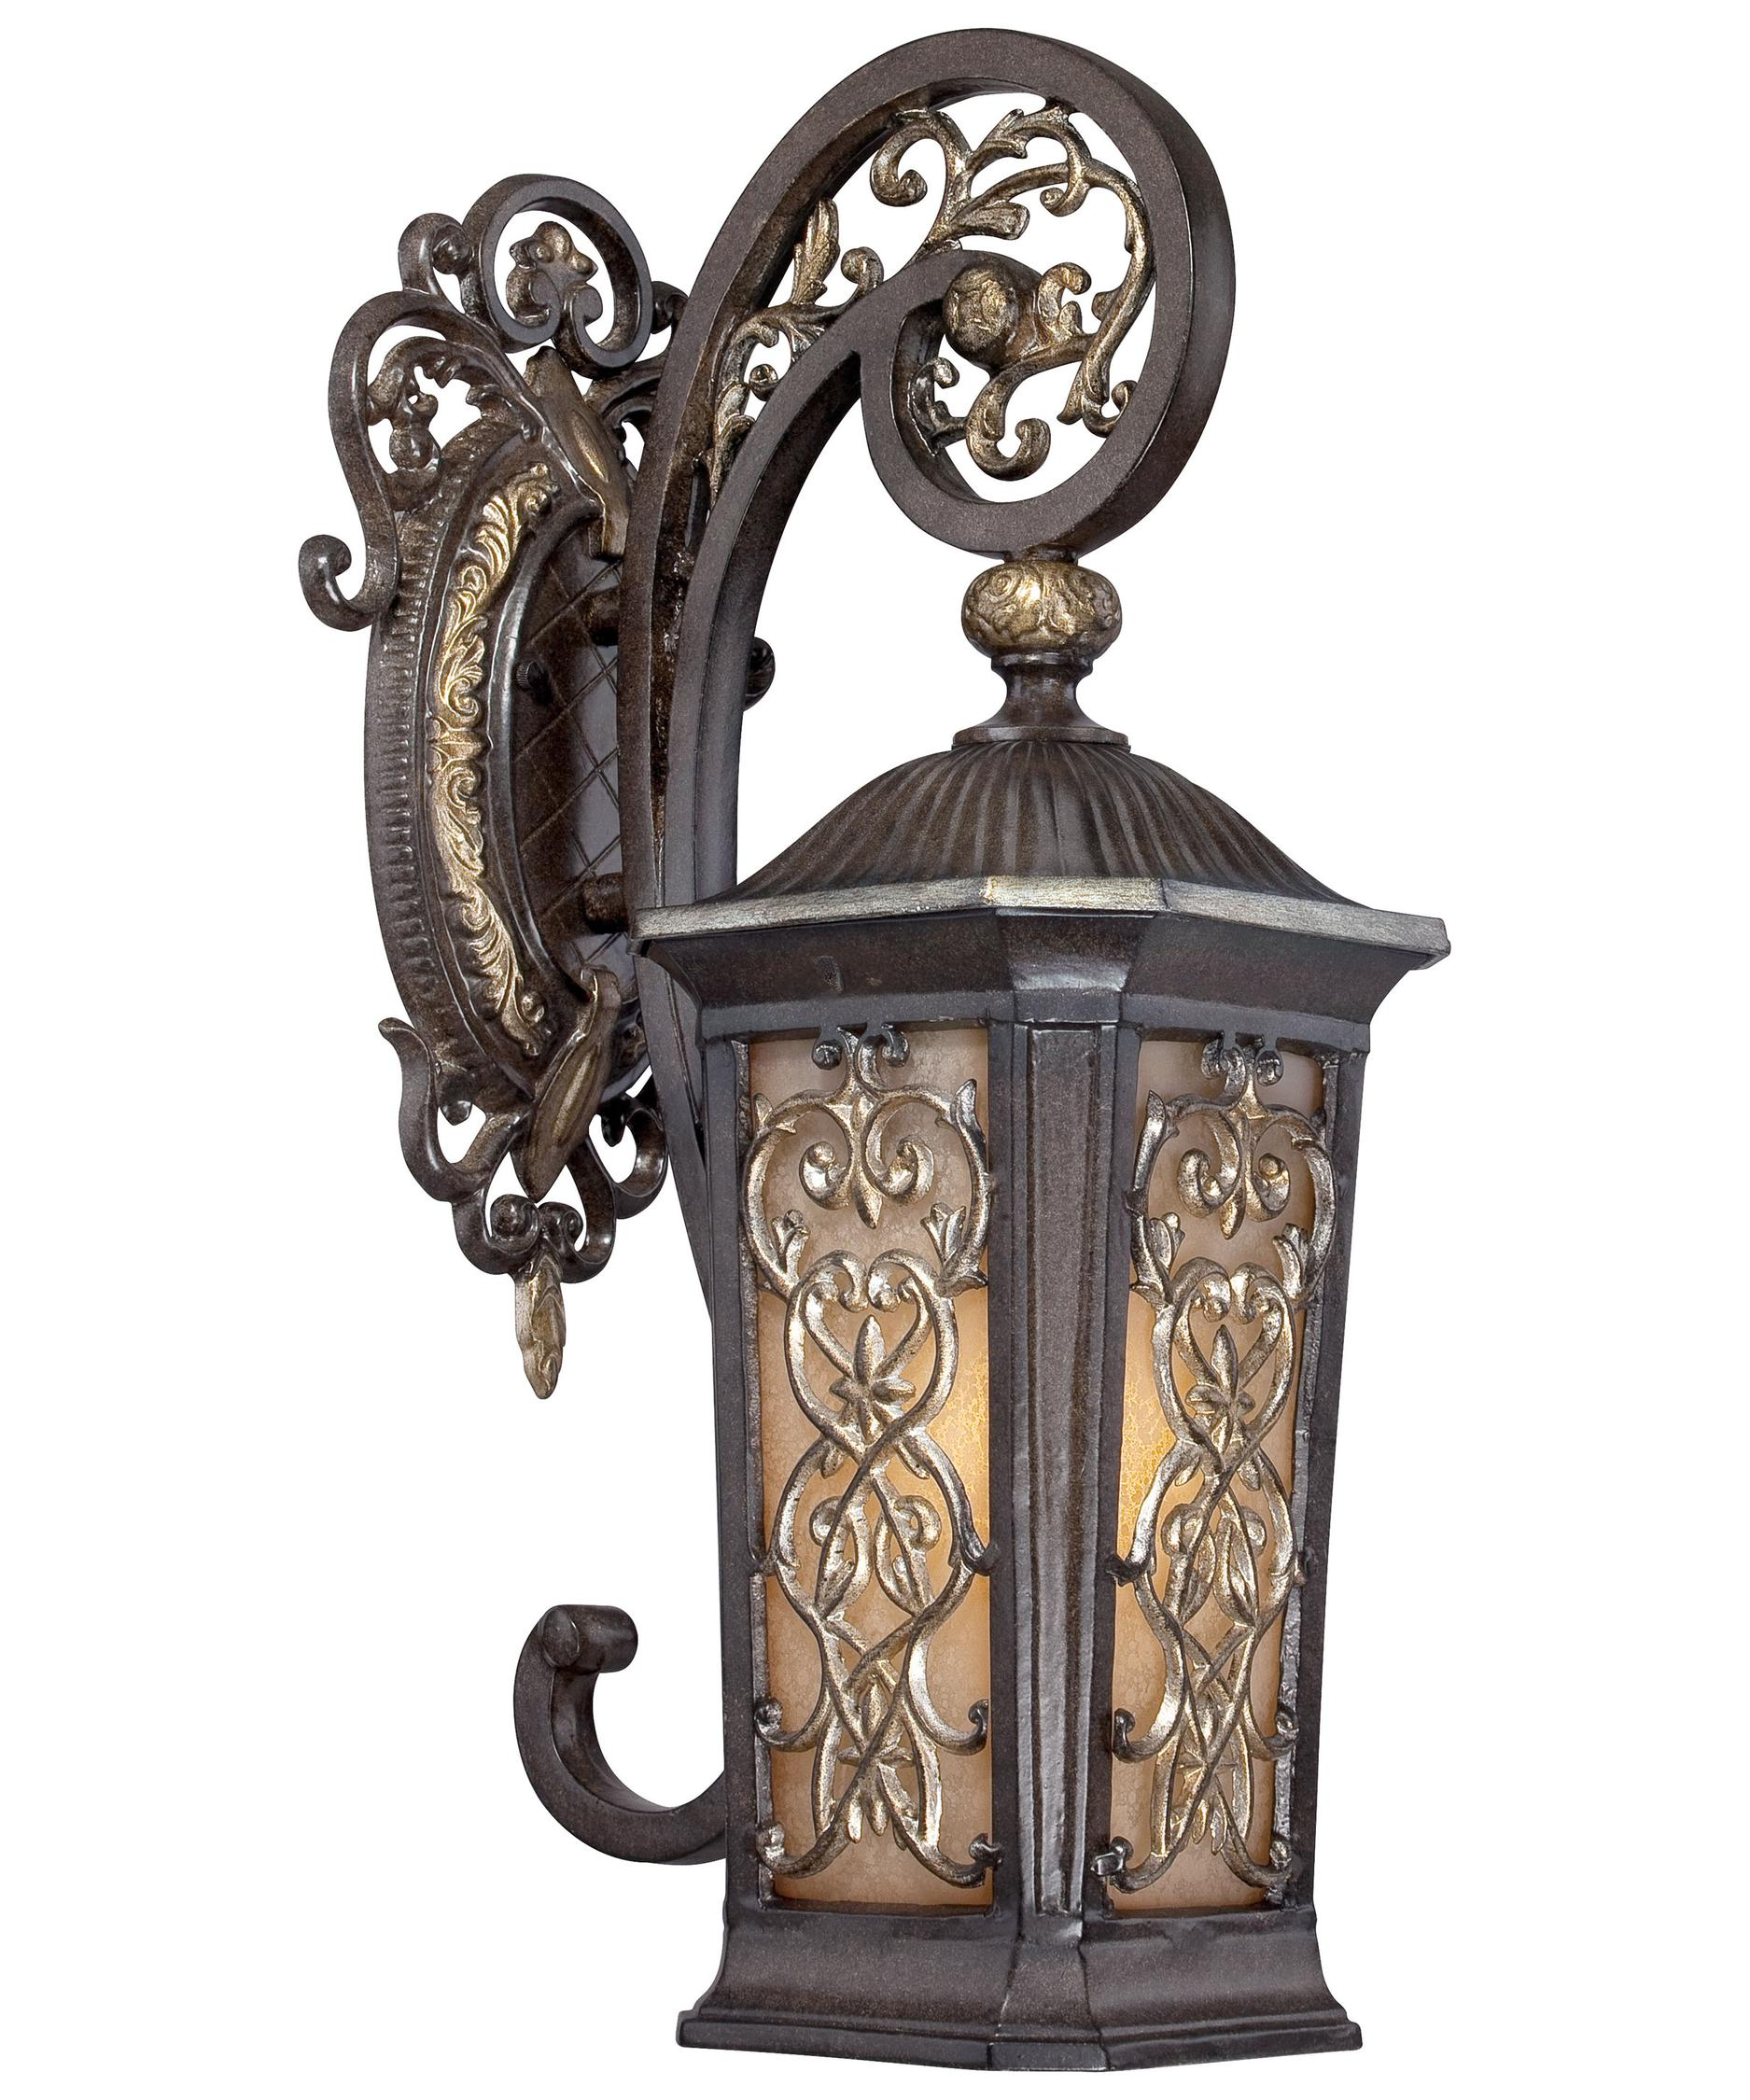 Marvelous Minka Lavery 9111 Romance Collection 9 Inch Wide 1 Light Outdoor Wall Light  | Capitol Lighting 1 800lighting.com